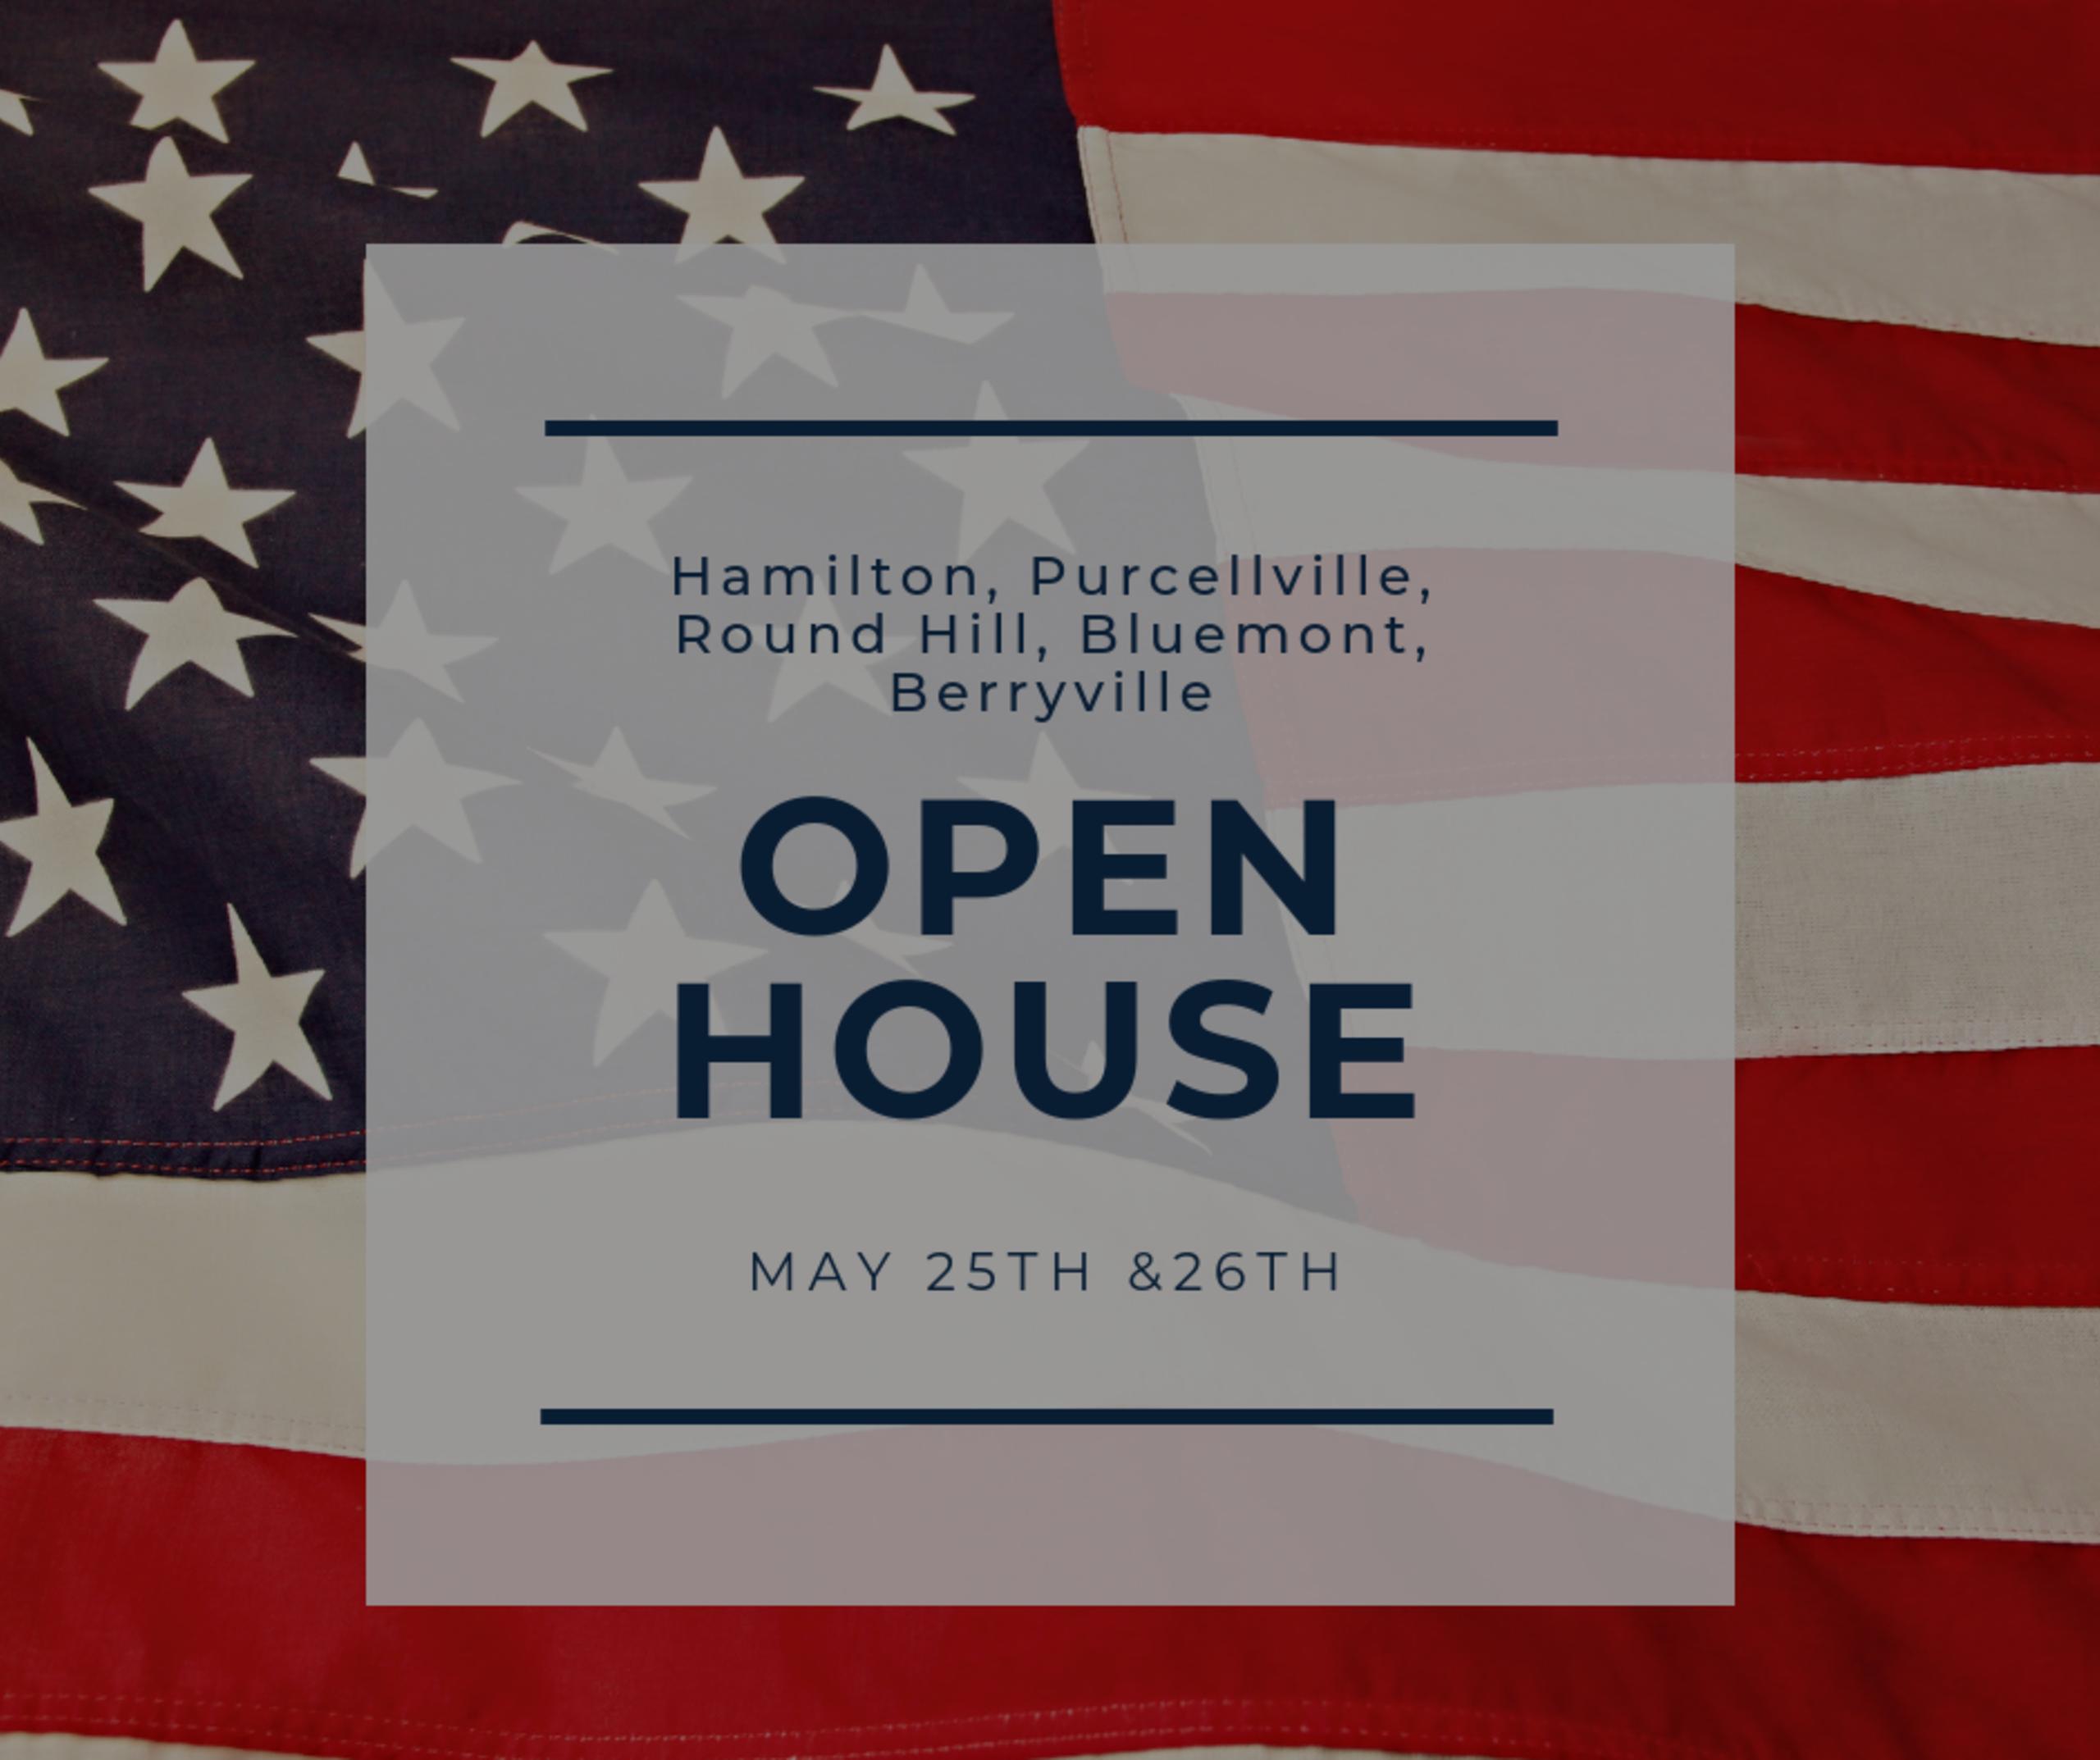 Open House List 4/25/19 – 4/26/19